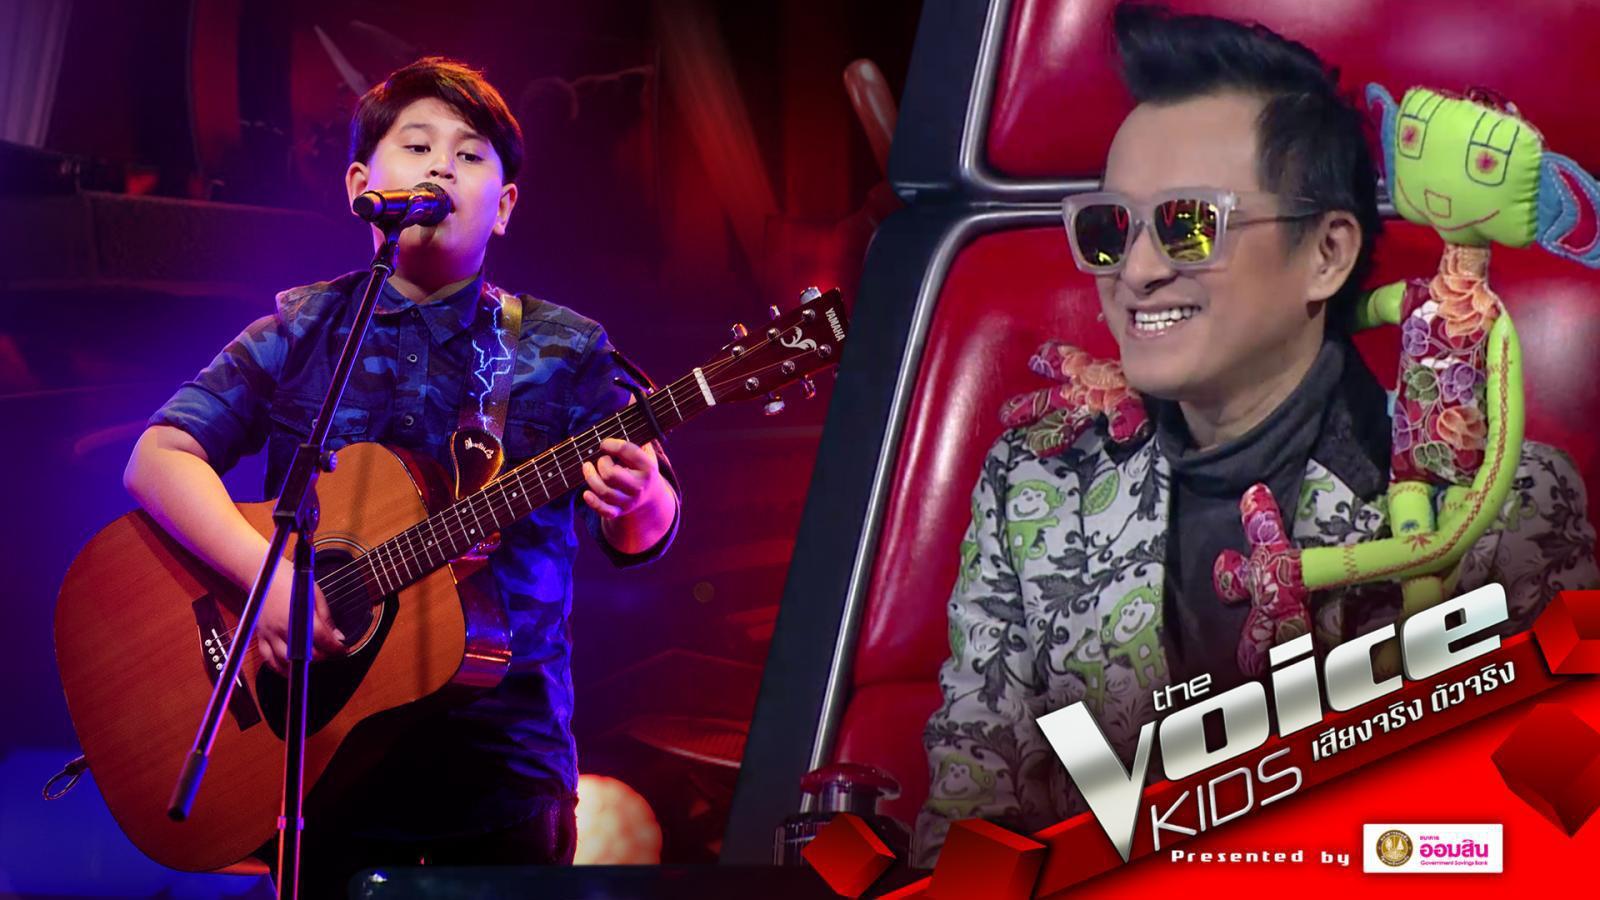 The Voice Kids 2020  Blind Auditions ครั้งที่1   หนุ่มร็อกฟันน้ำนม เสียงเท่ห์กระชากใจ